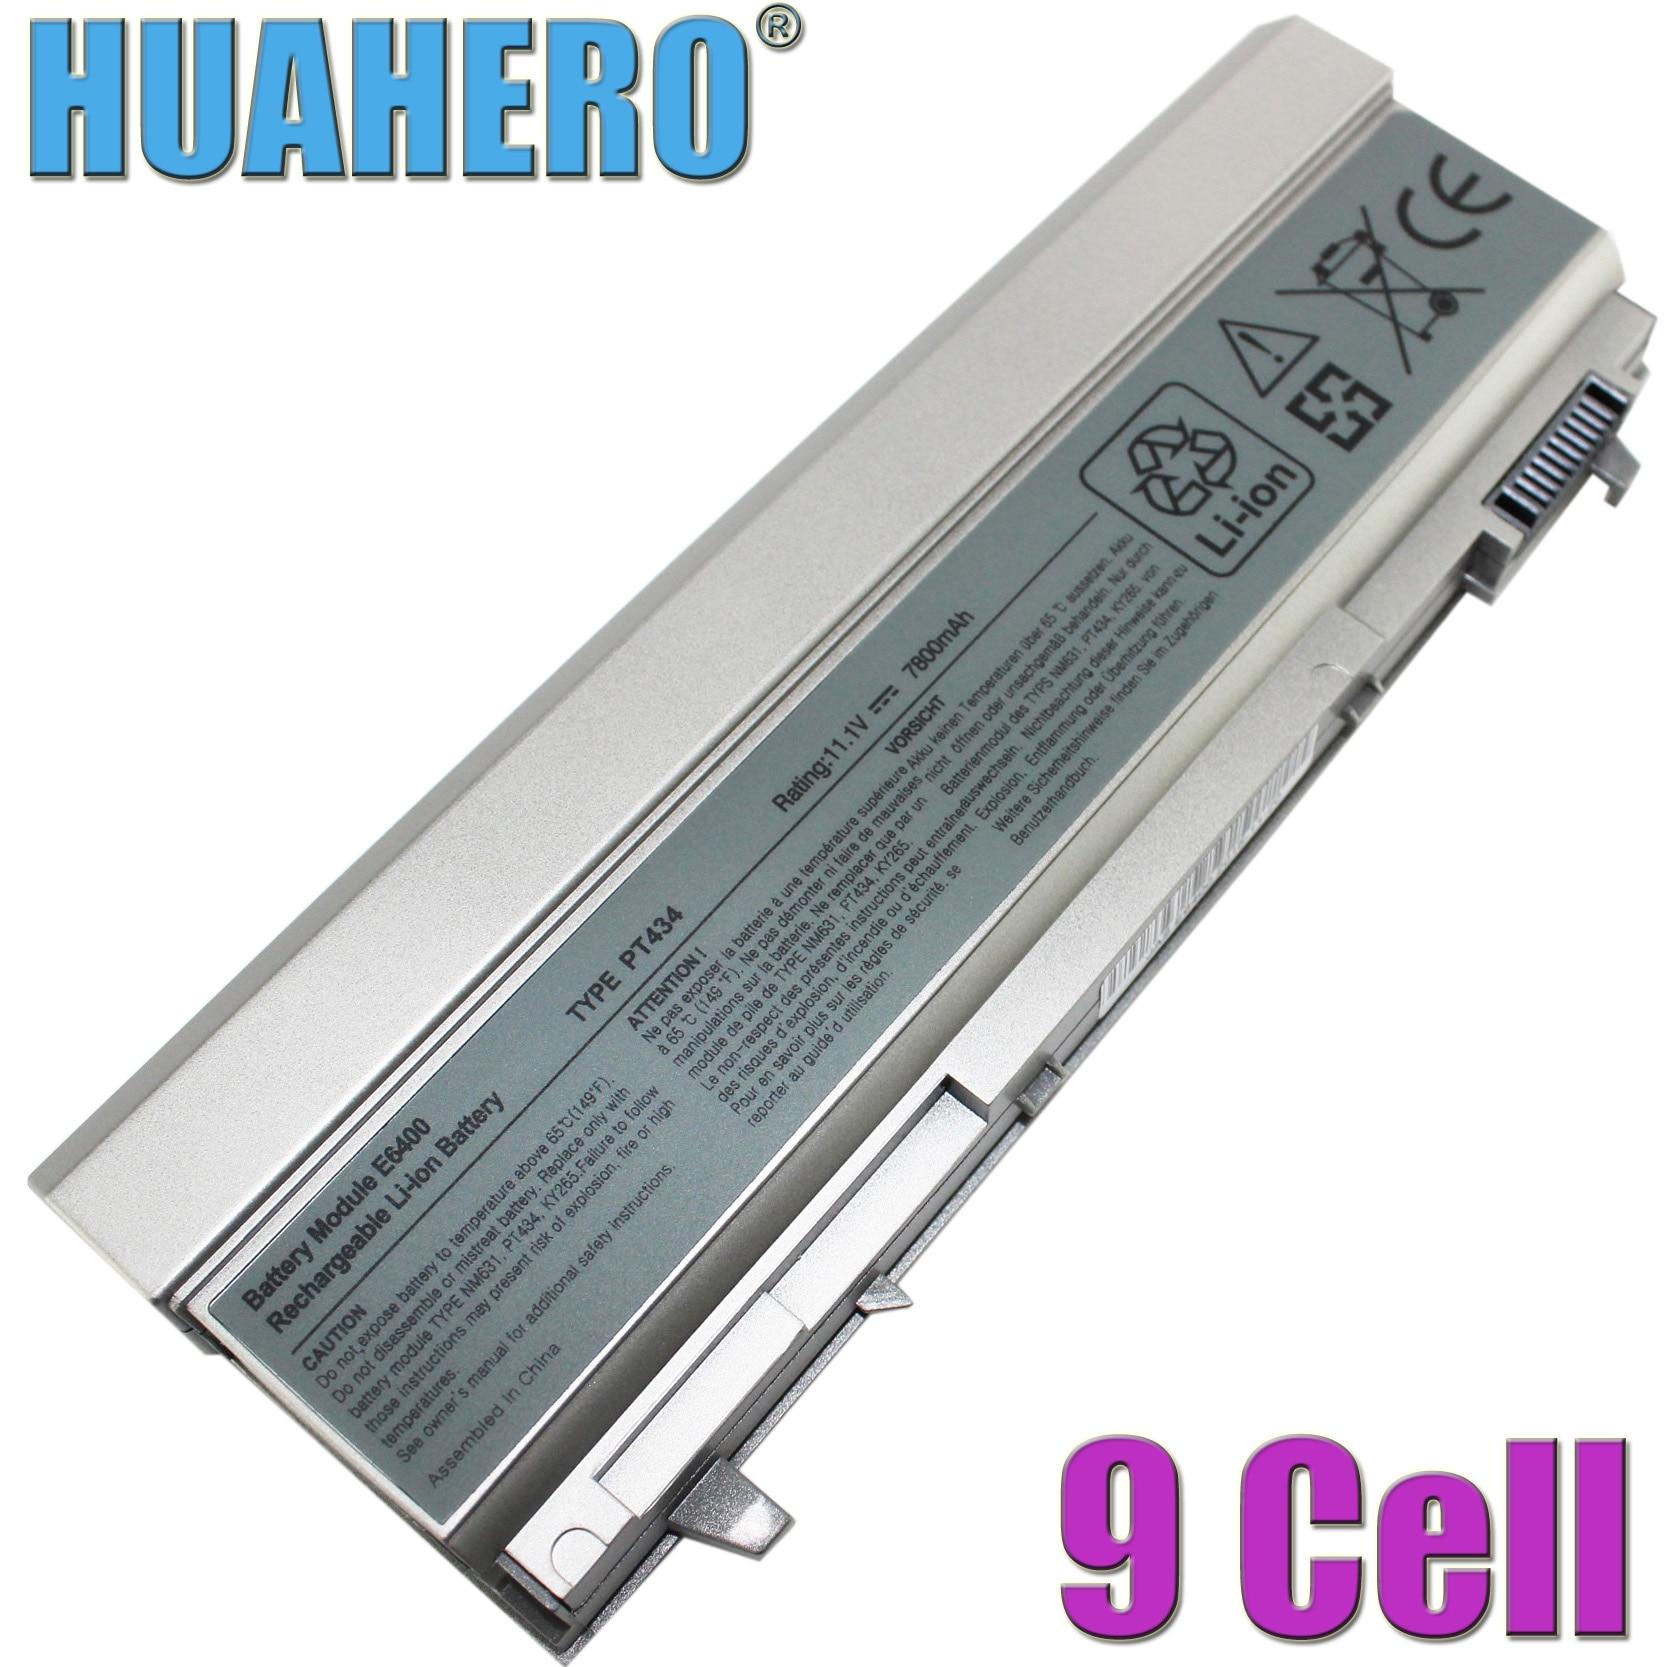 HUAHERO 9 ячеек Аккумулятор для ноутбука Dell Latitude E6400 E6410 E6500 E6510 KY477 PT434 W1193 U844G 312-0748 312-0754 0917 451-10583 FU268